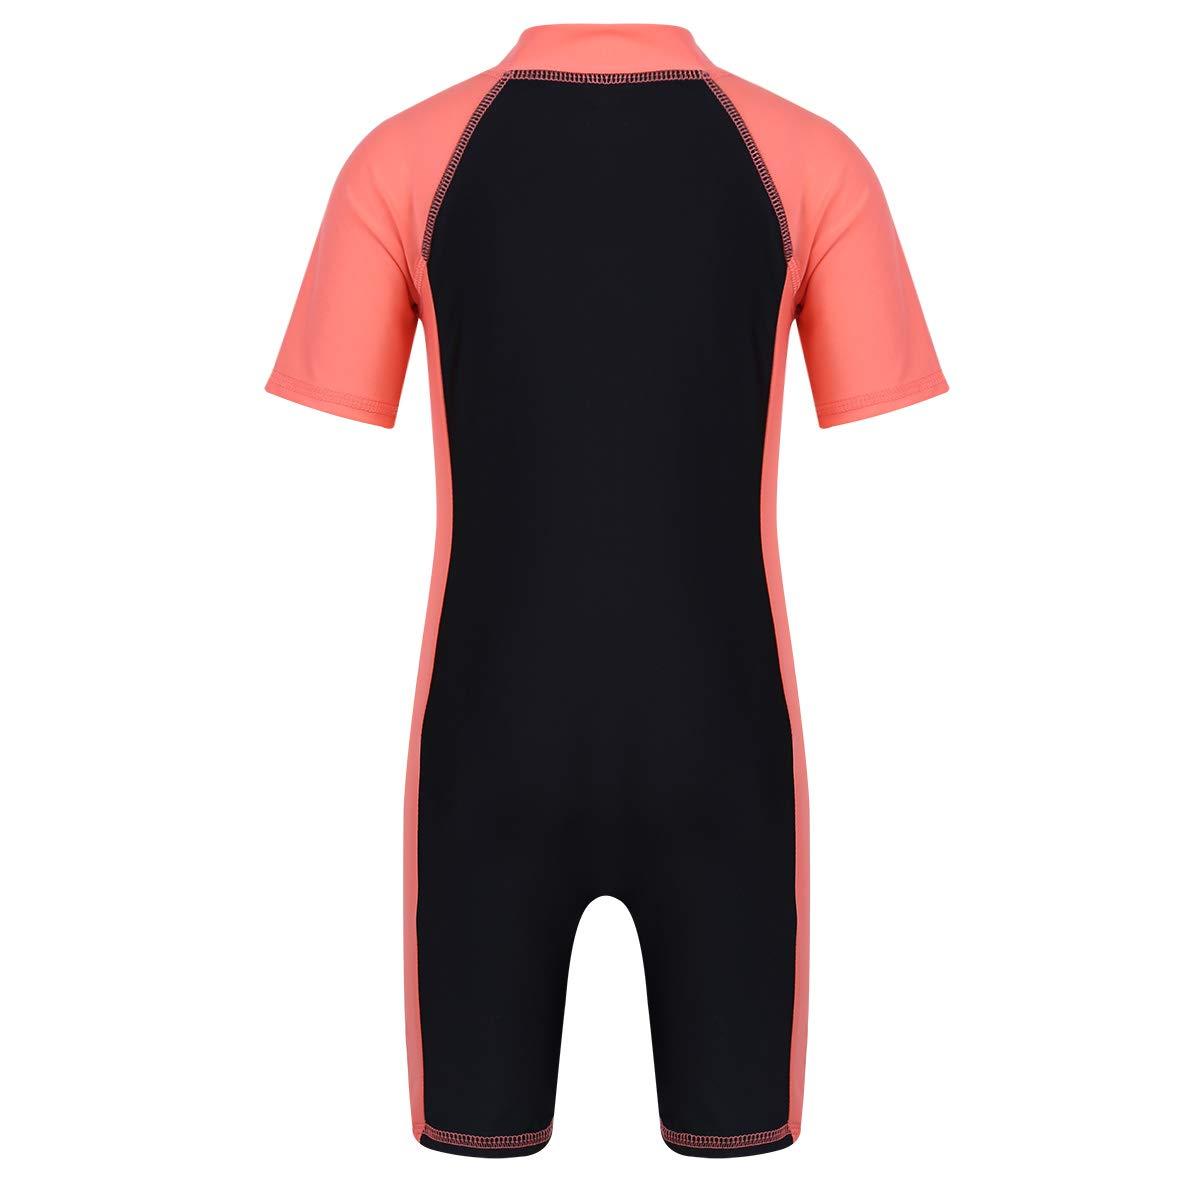 moily Unisex Boys//Girls Zippered Thermal Shorty Wetsuit UV Sun Protection Rash Guard Set Swimwear